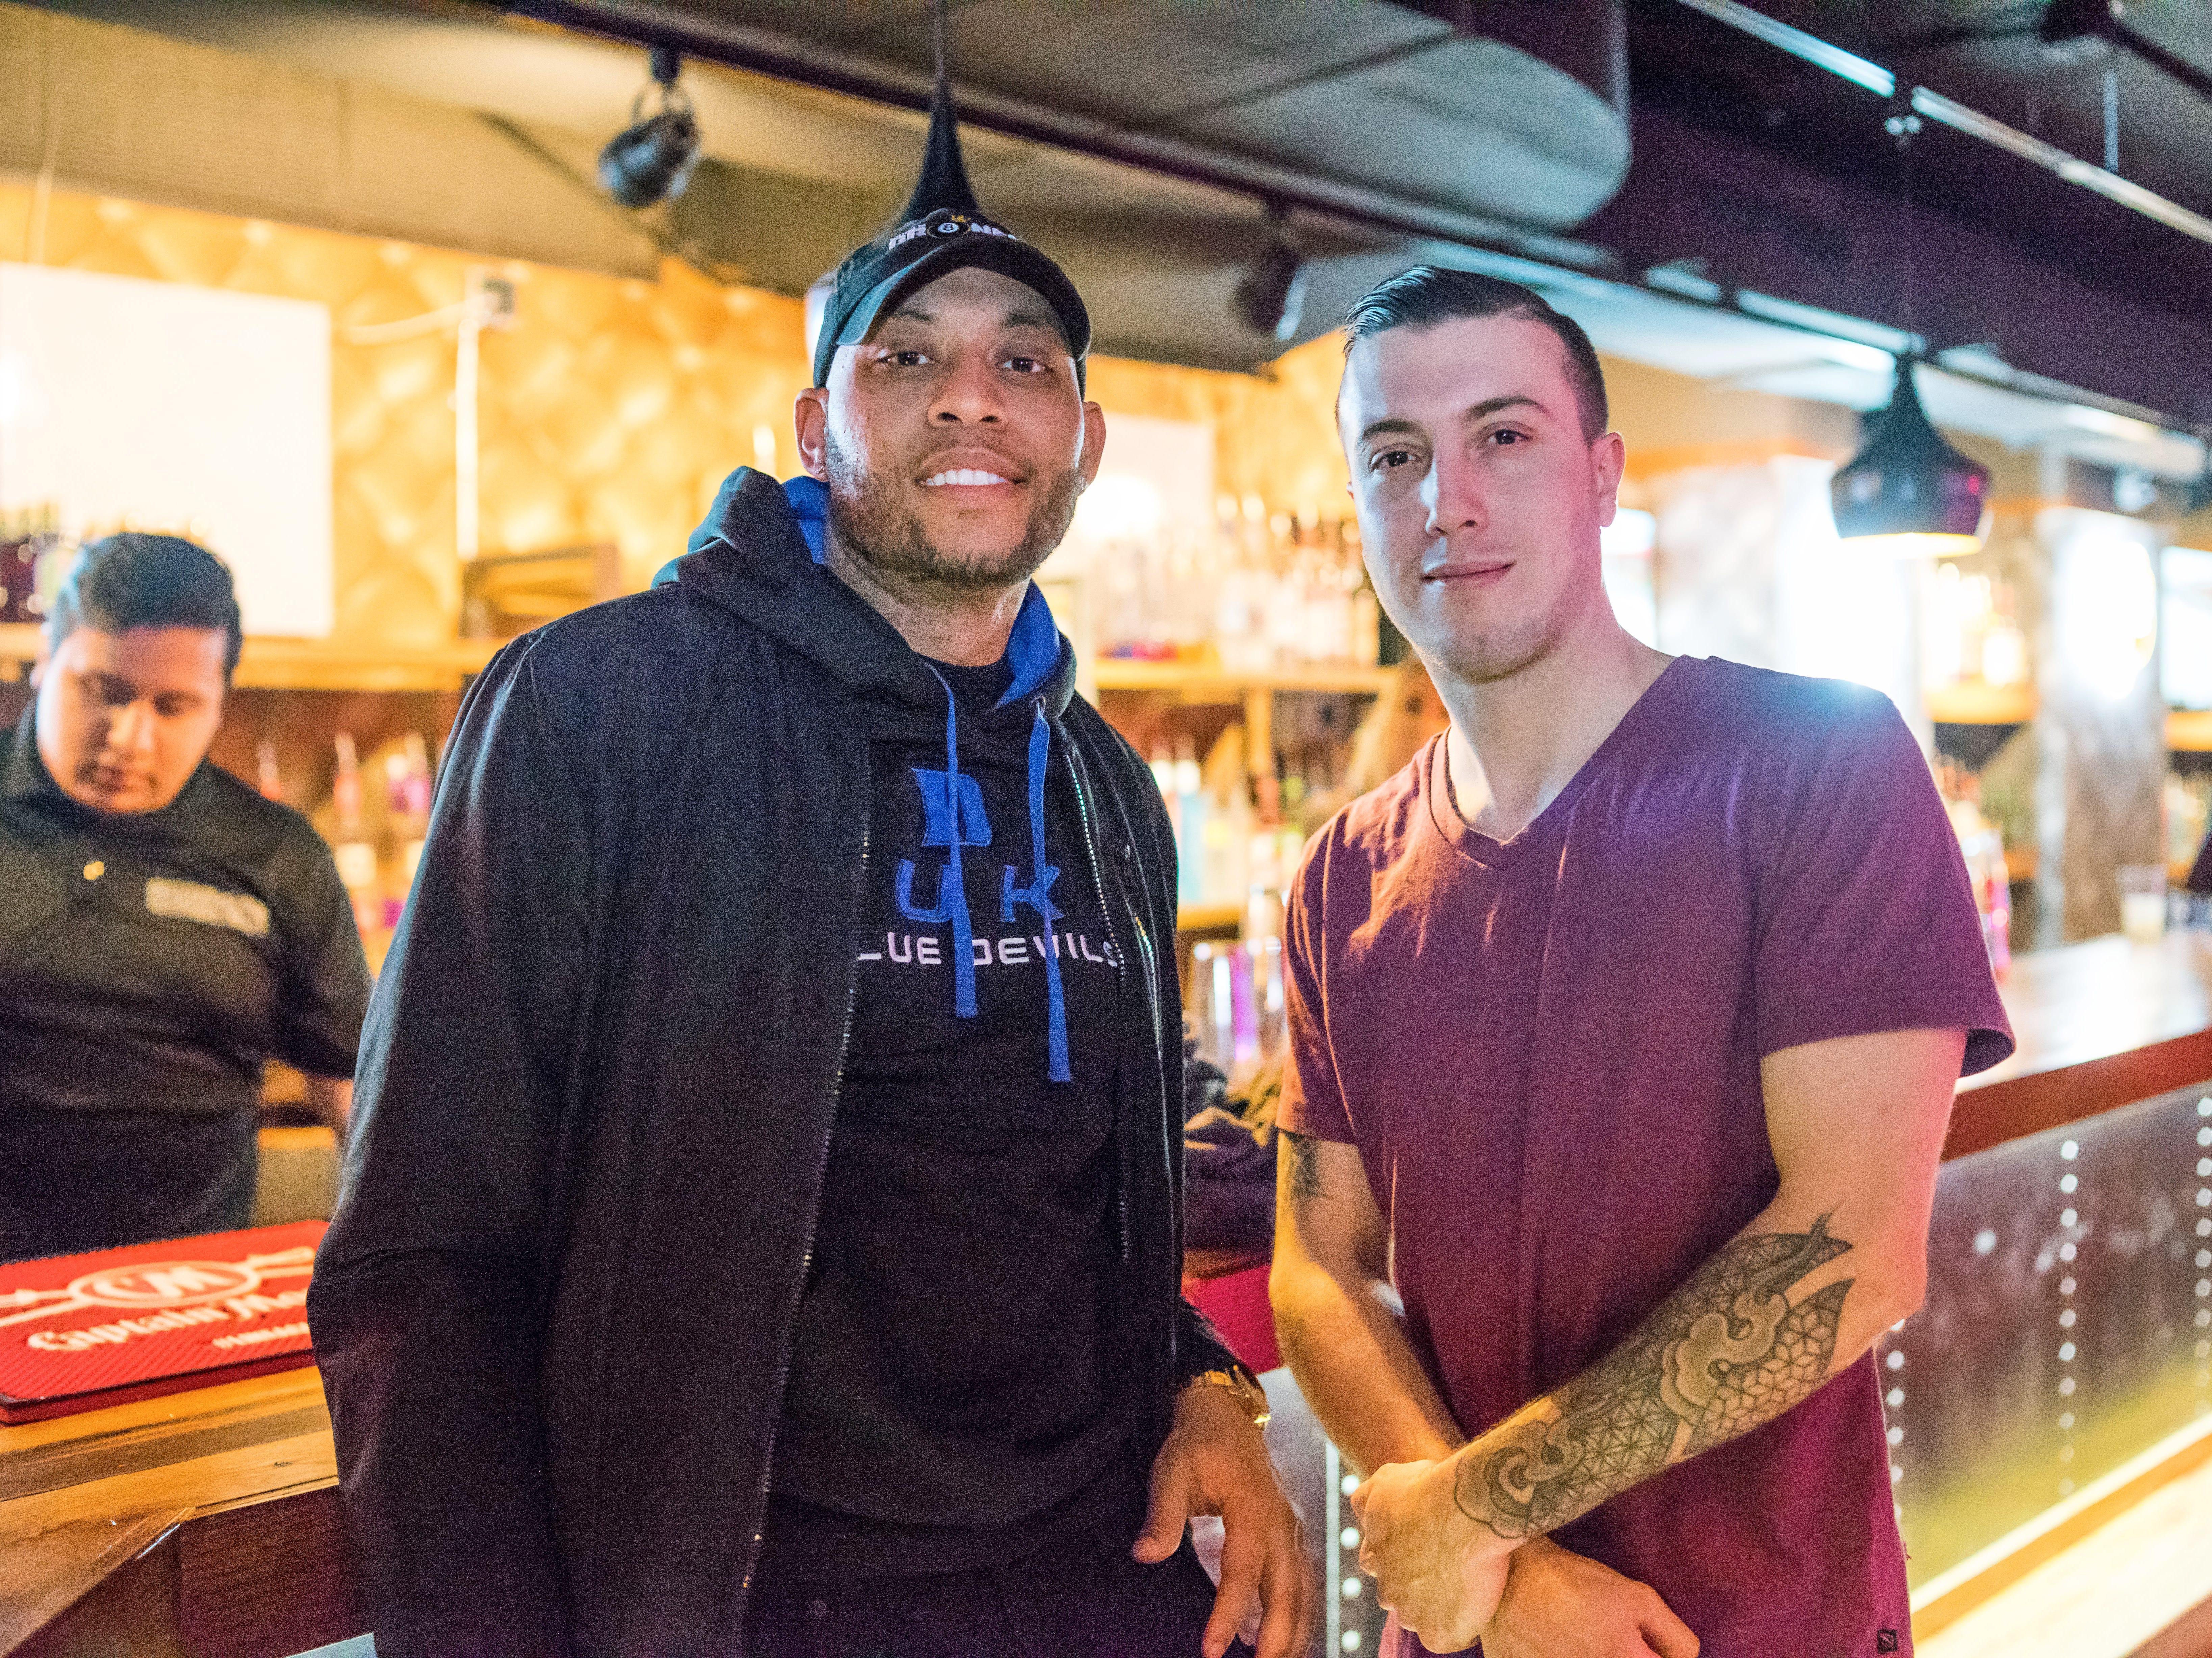 Duke Moffett, 30, and Deckar Lynch, 27, both of Des Moines, enjoying their night out, Friday, March 15th, at Shags.